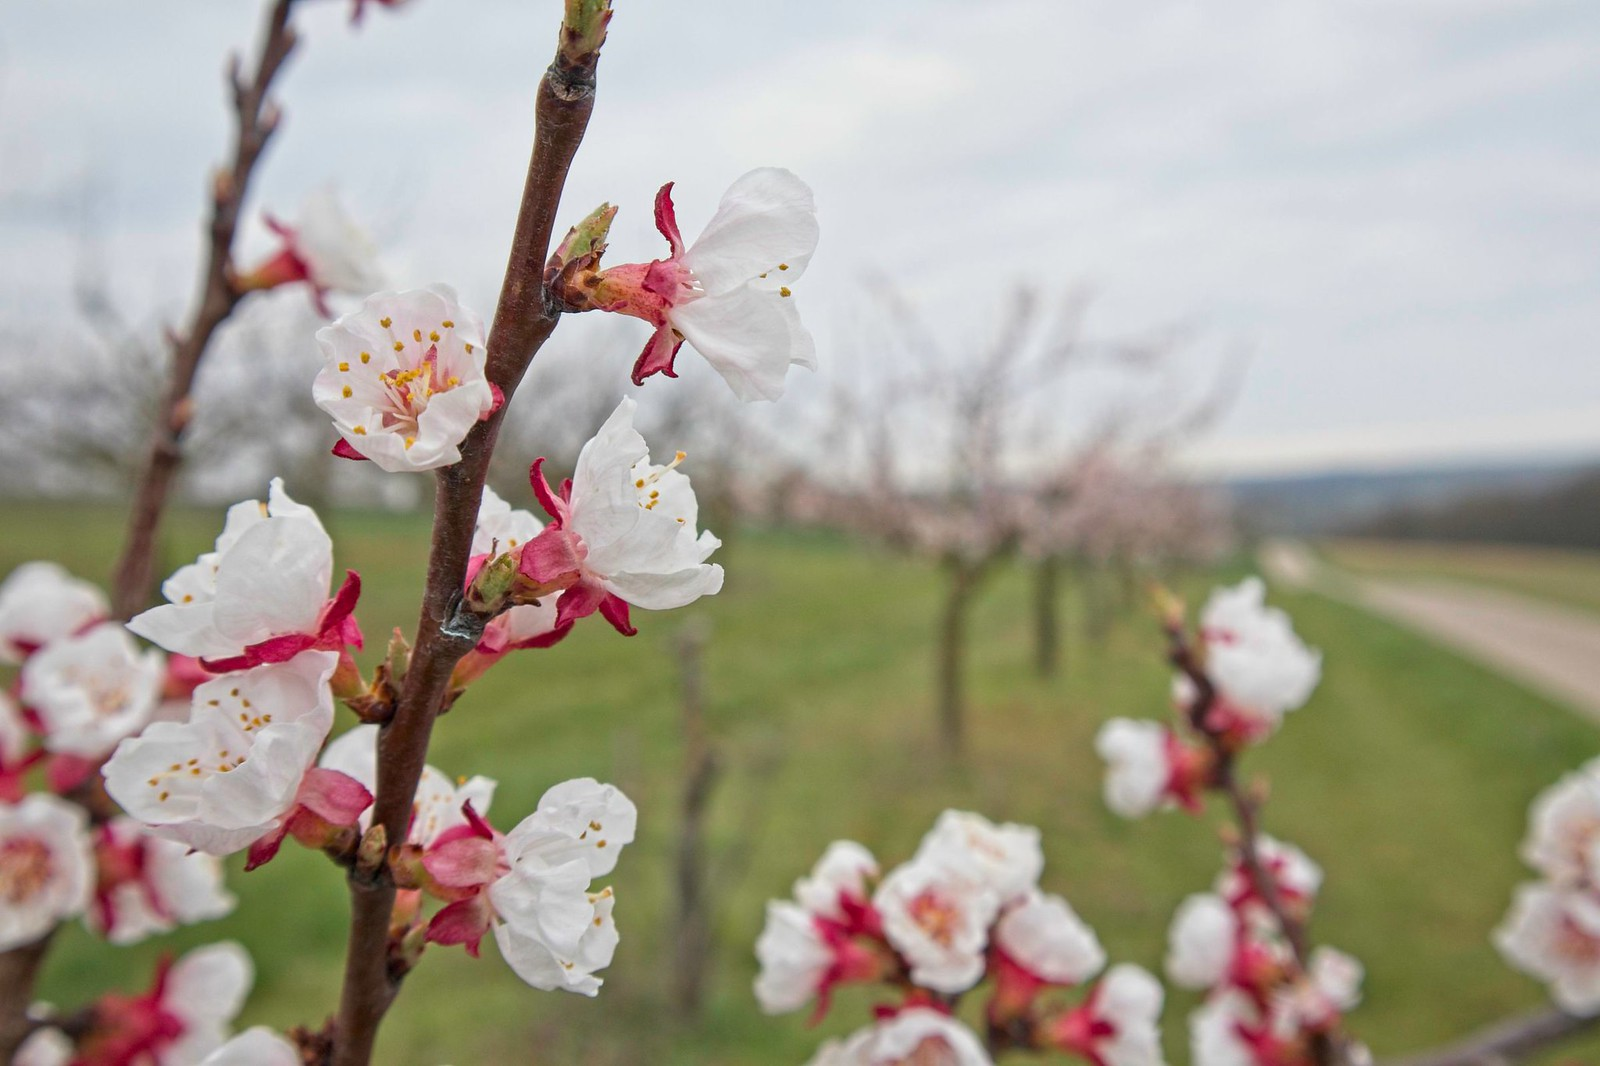 Kirschblüten bei Schwabenheim an der Selz